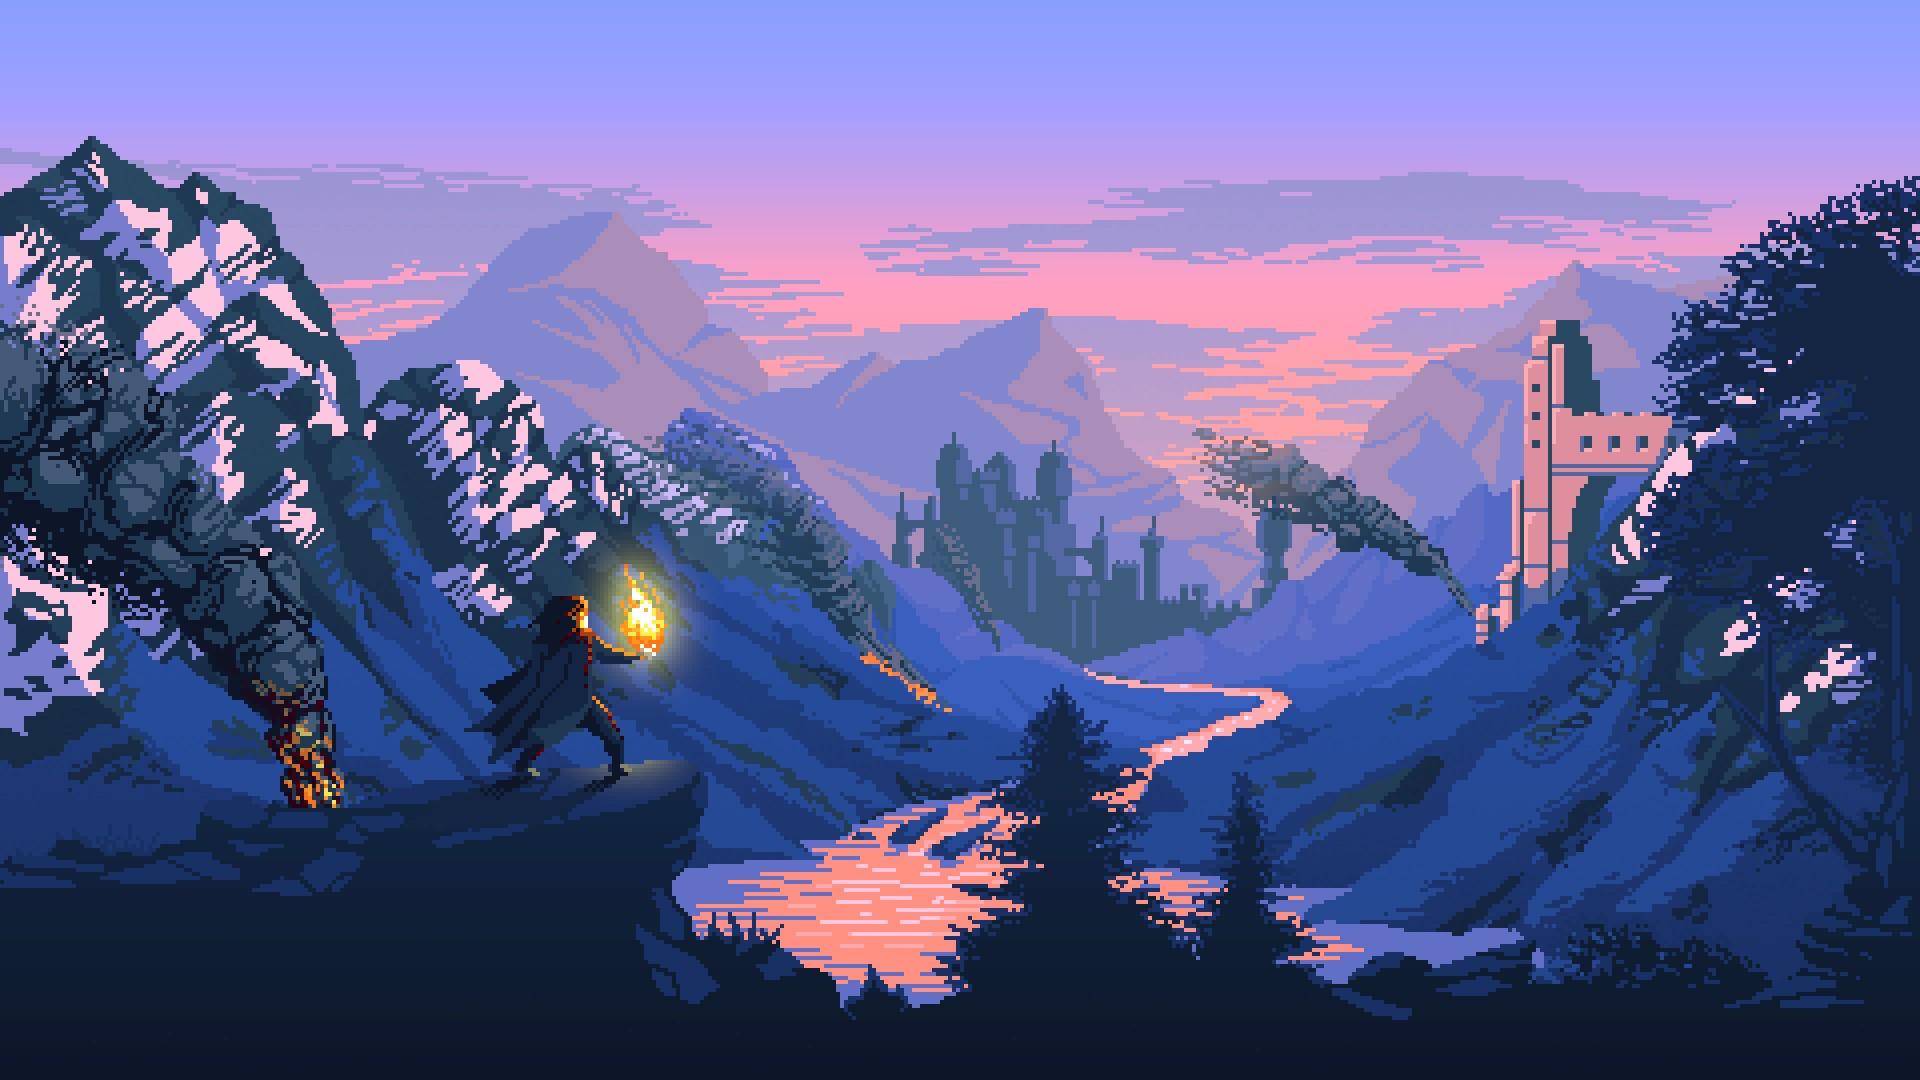 Mountains Digital Art Fantasy Pixel Castle Wilderness Alps Terrain Mountain Screenshot Computer Wallpaper Mountainous